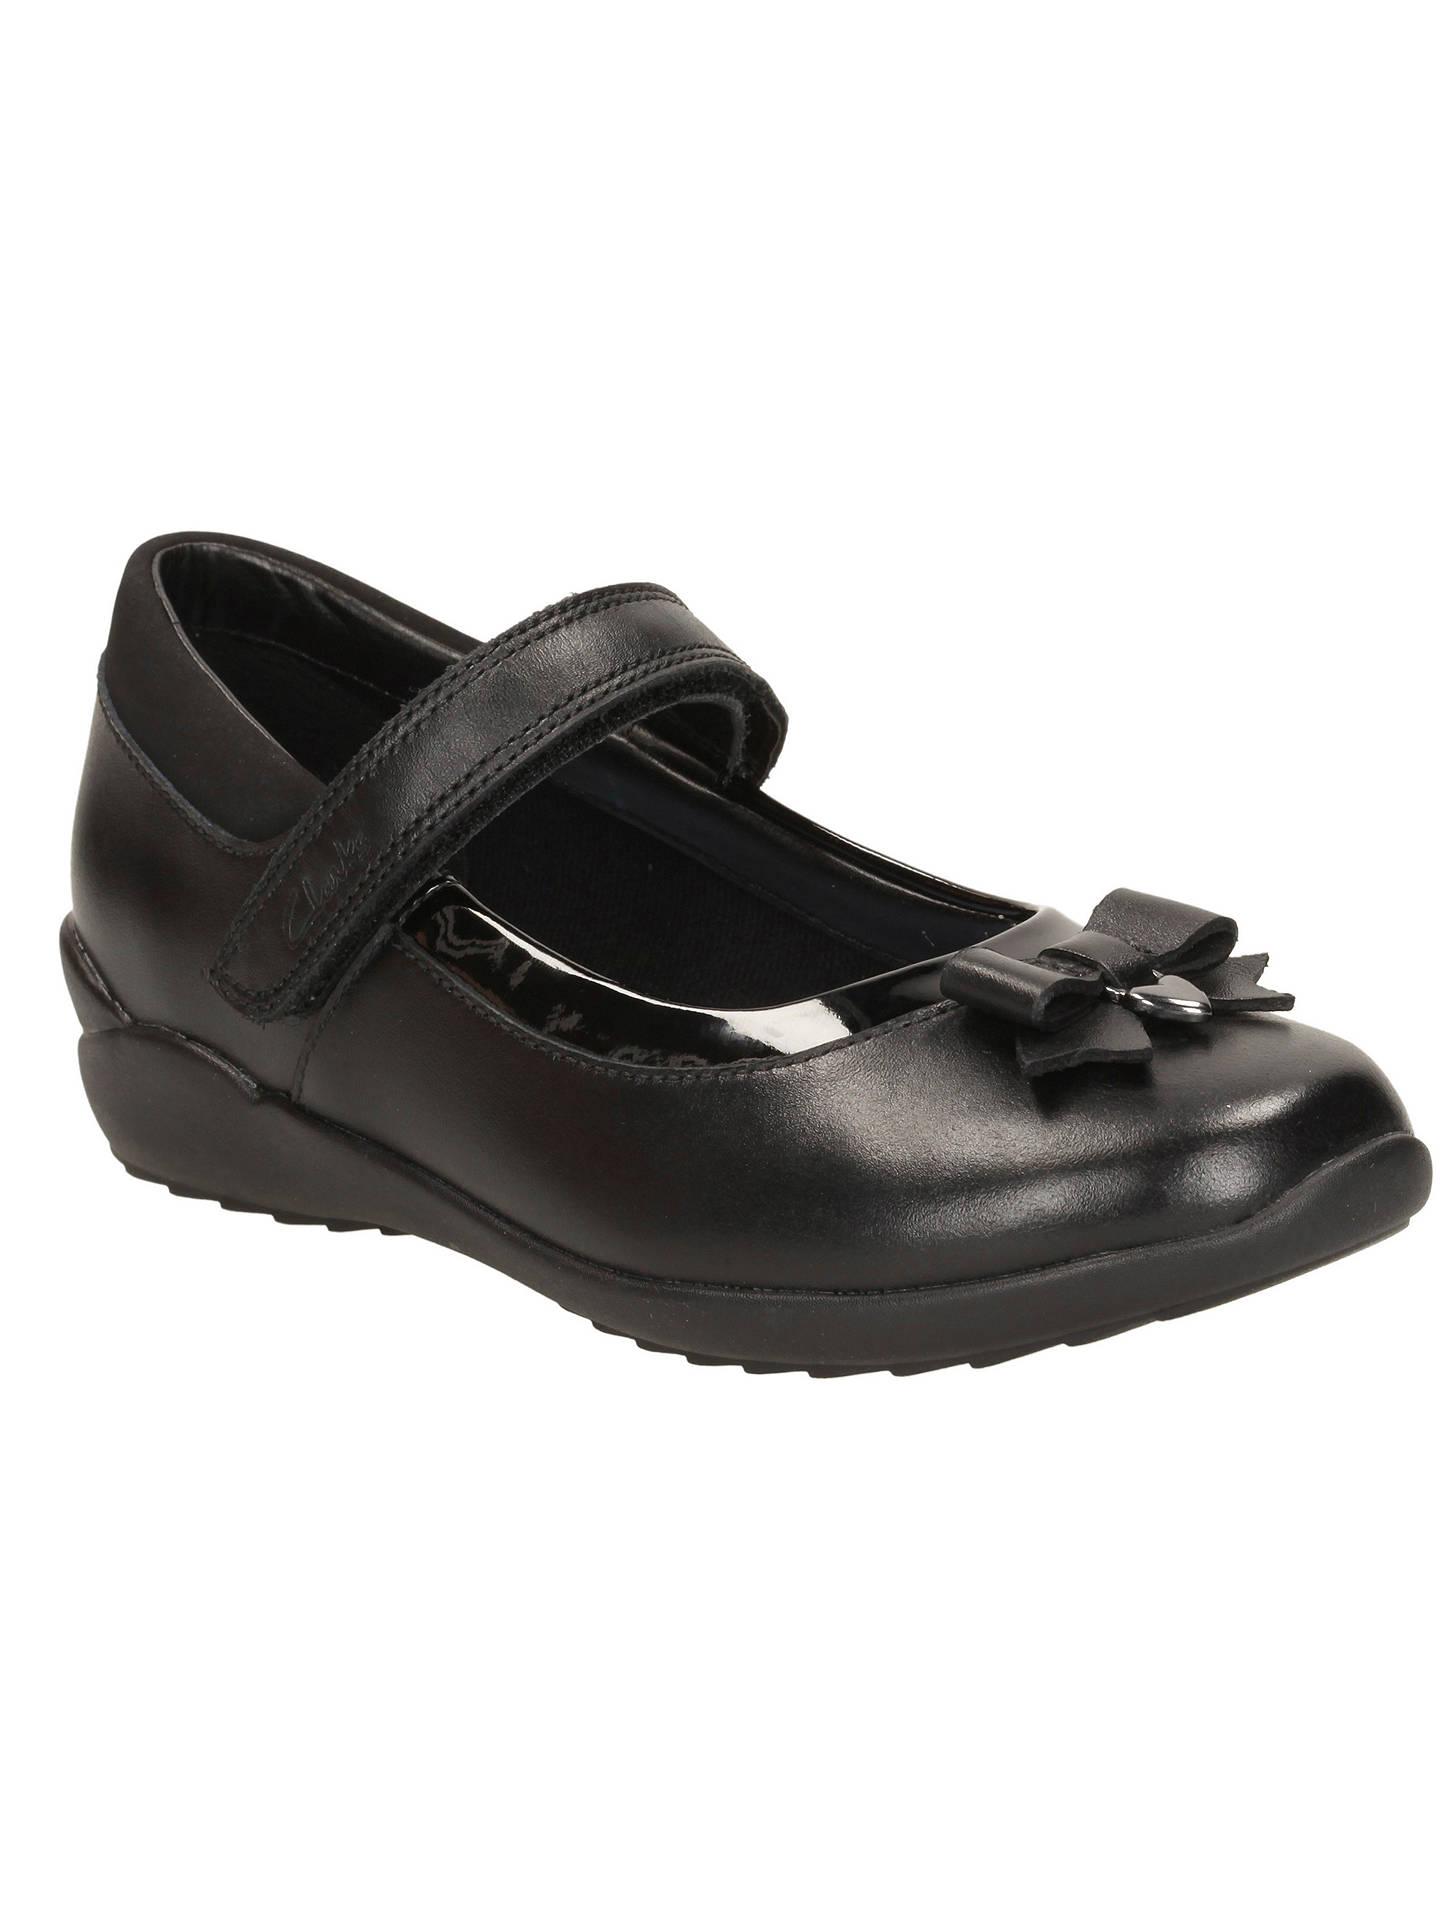 5c4532294ac Buy Clarks Children's Gloform Ting Fever School Shoes, Black, 10E Jnr  Online at johnlewis ...